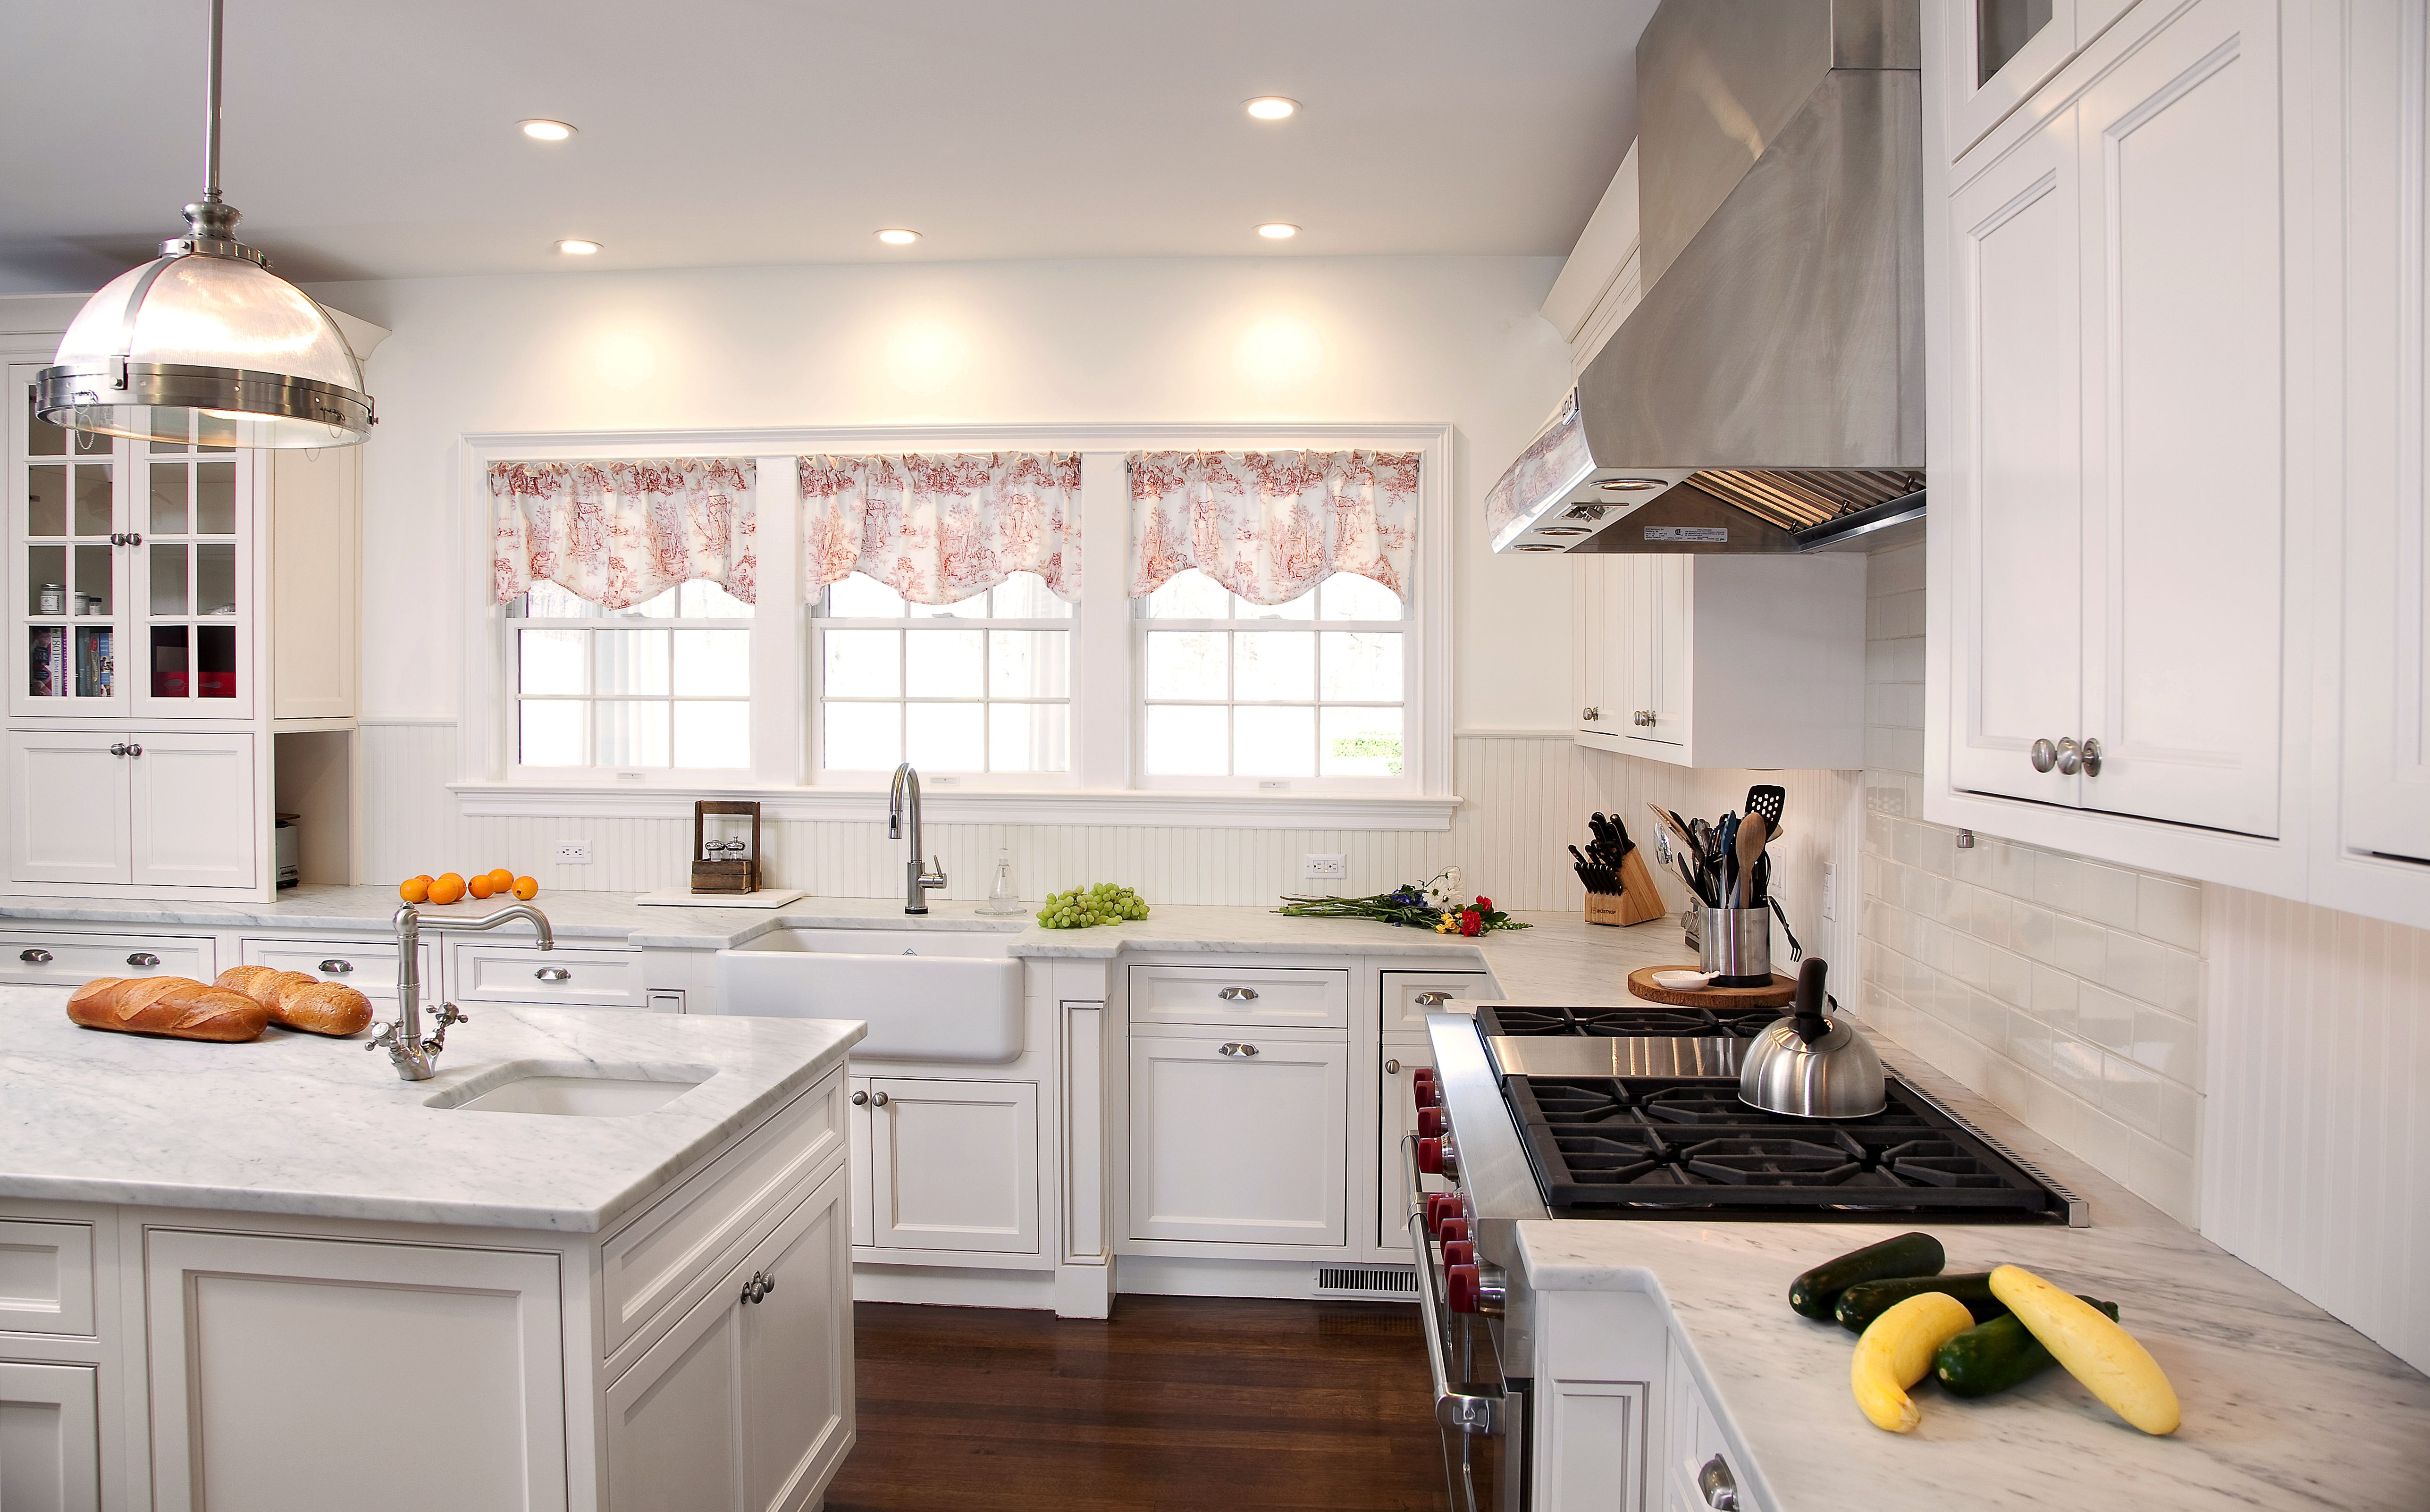 Warwick Ny Kitchen By Kuche Cucina Modern Traditional Or Like Many